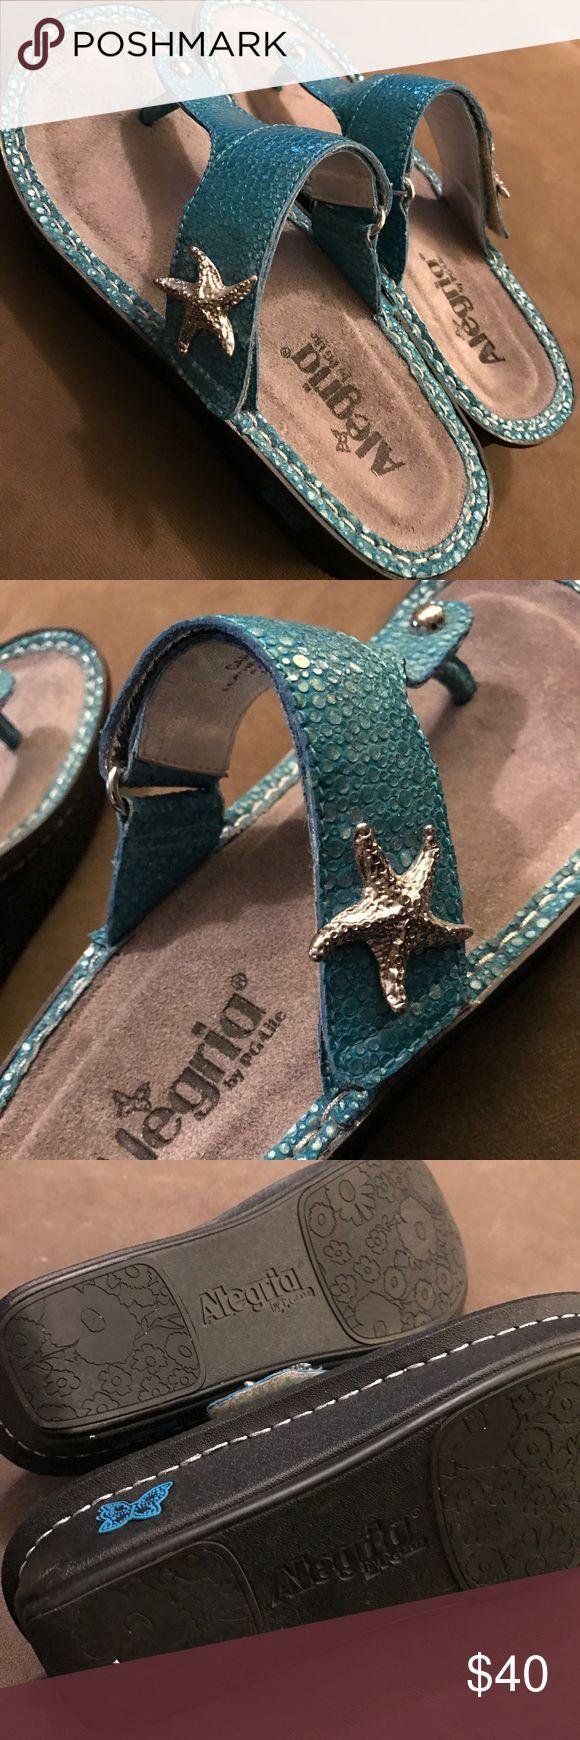 NEW Algeria team sandals Cute sandals for summer! Alegria Shoes Sandals